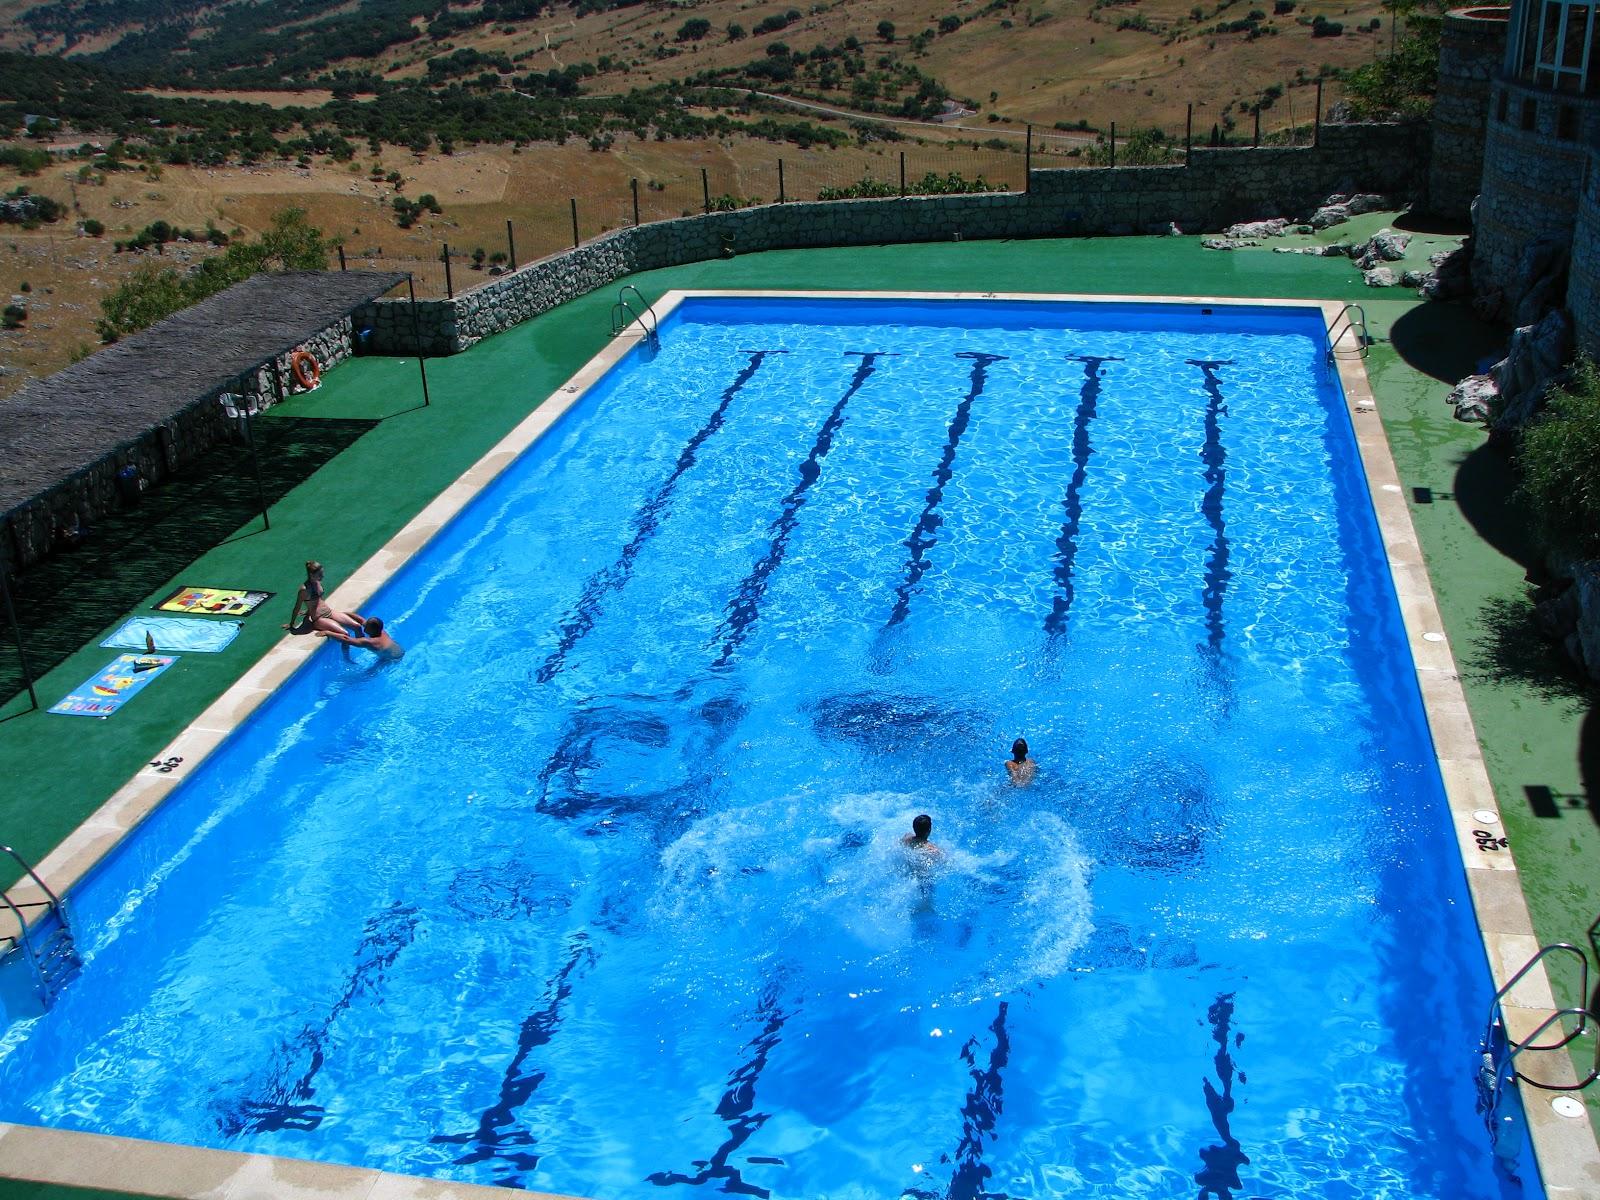 Radio grazalema este viernes abre sus puertas la piscina for Piscina municipal de salt